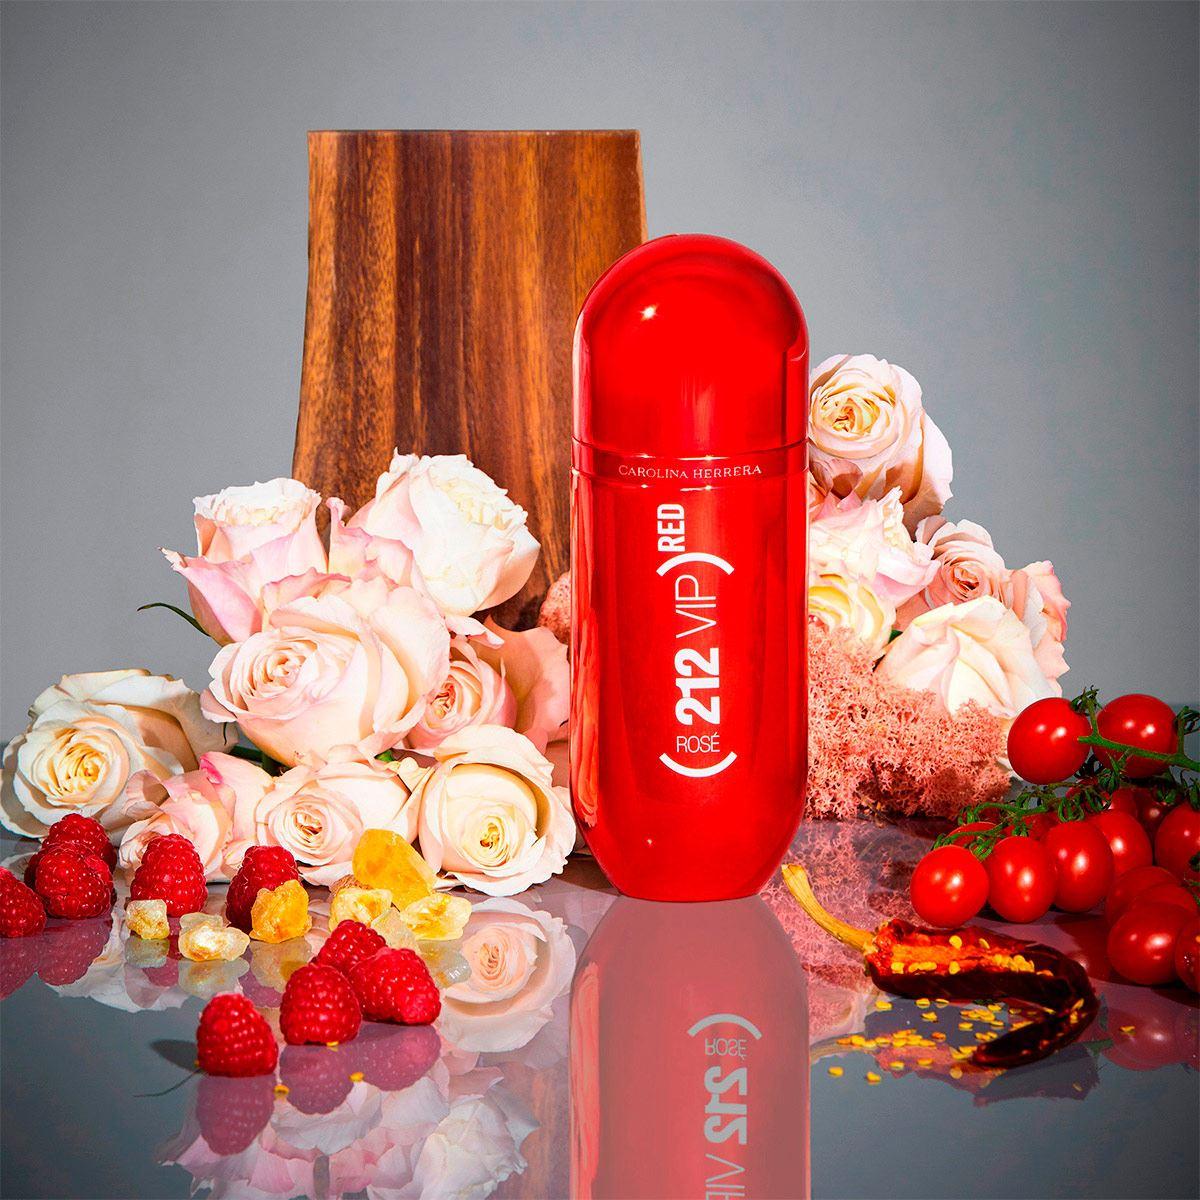 Fragancia para Dama 212 VIP Rosé (Red) Carolina Herrera 80 ML